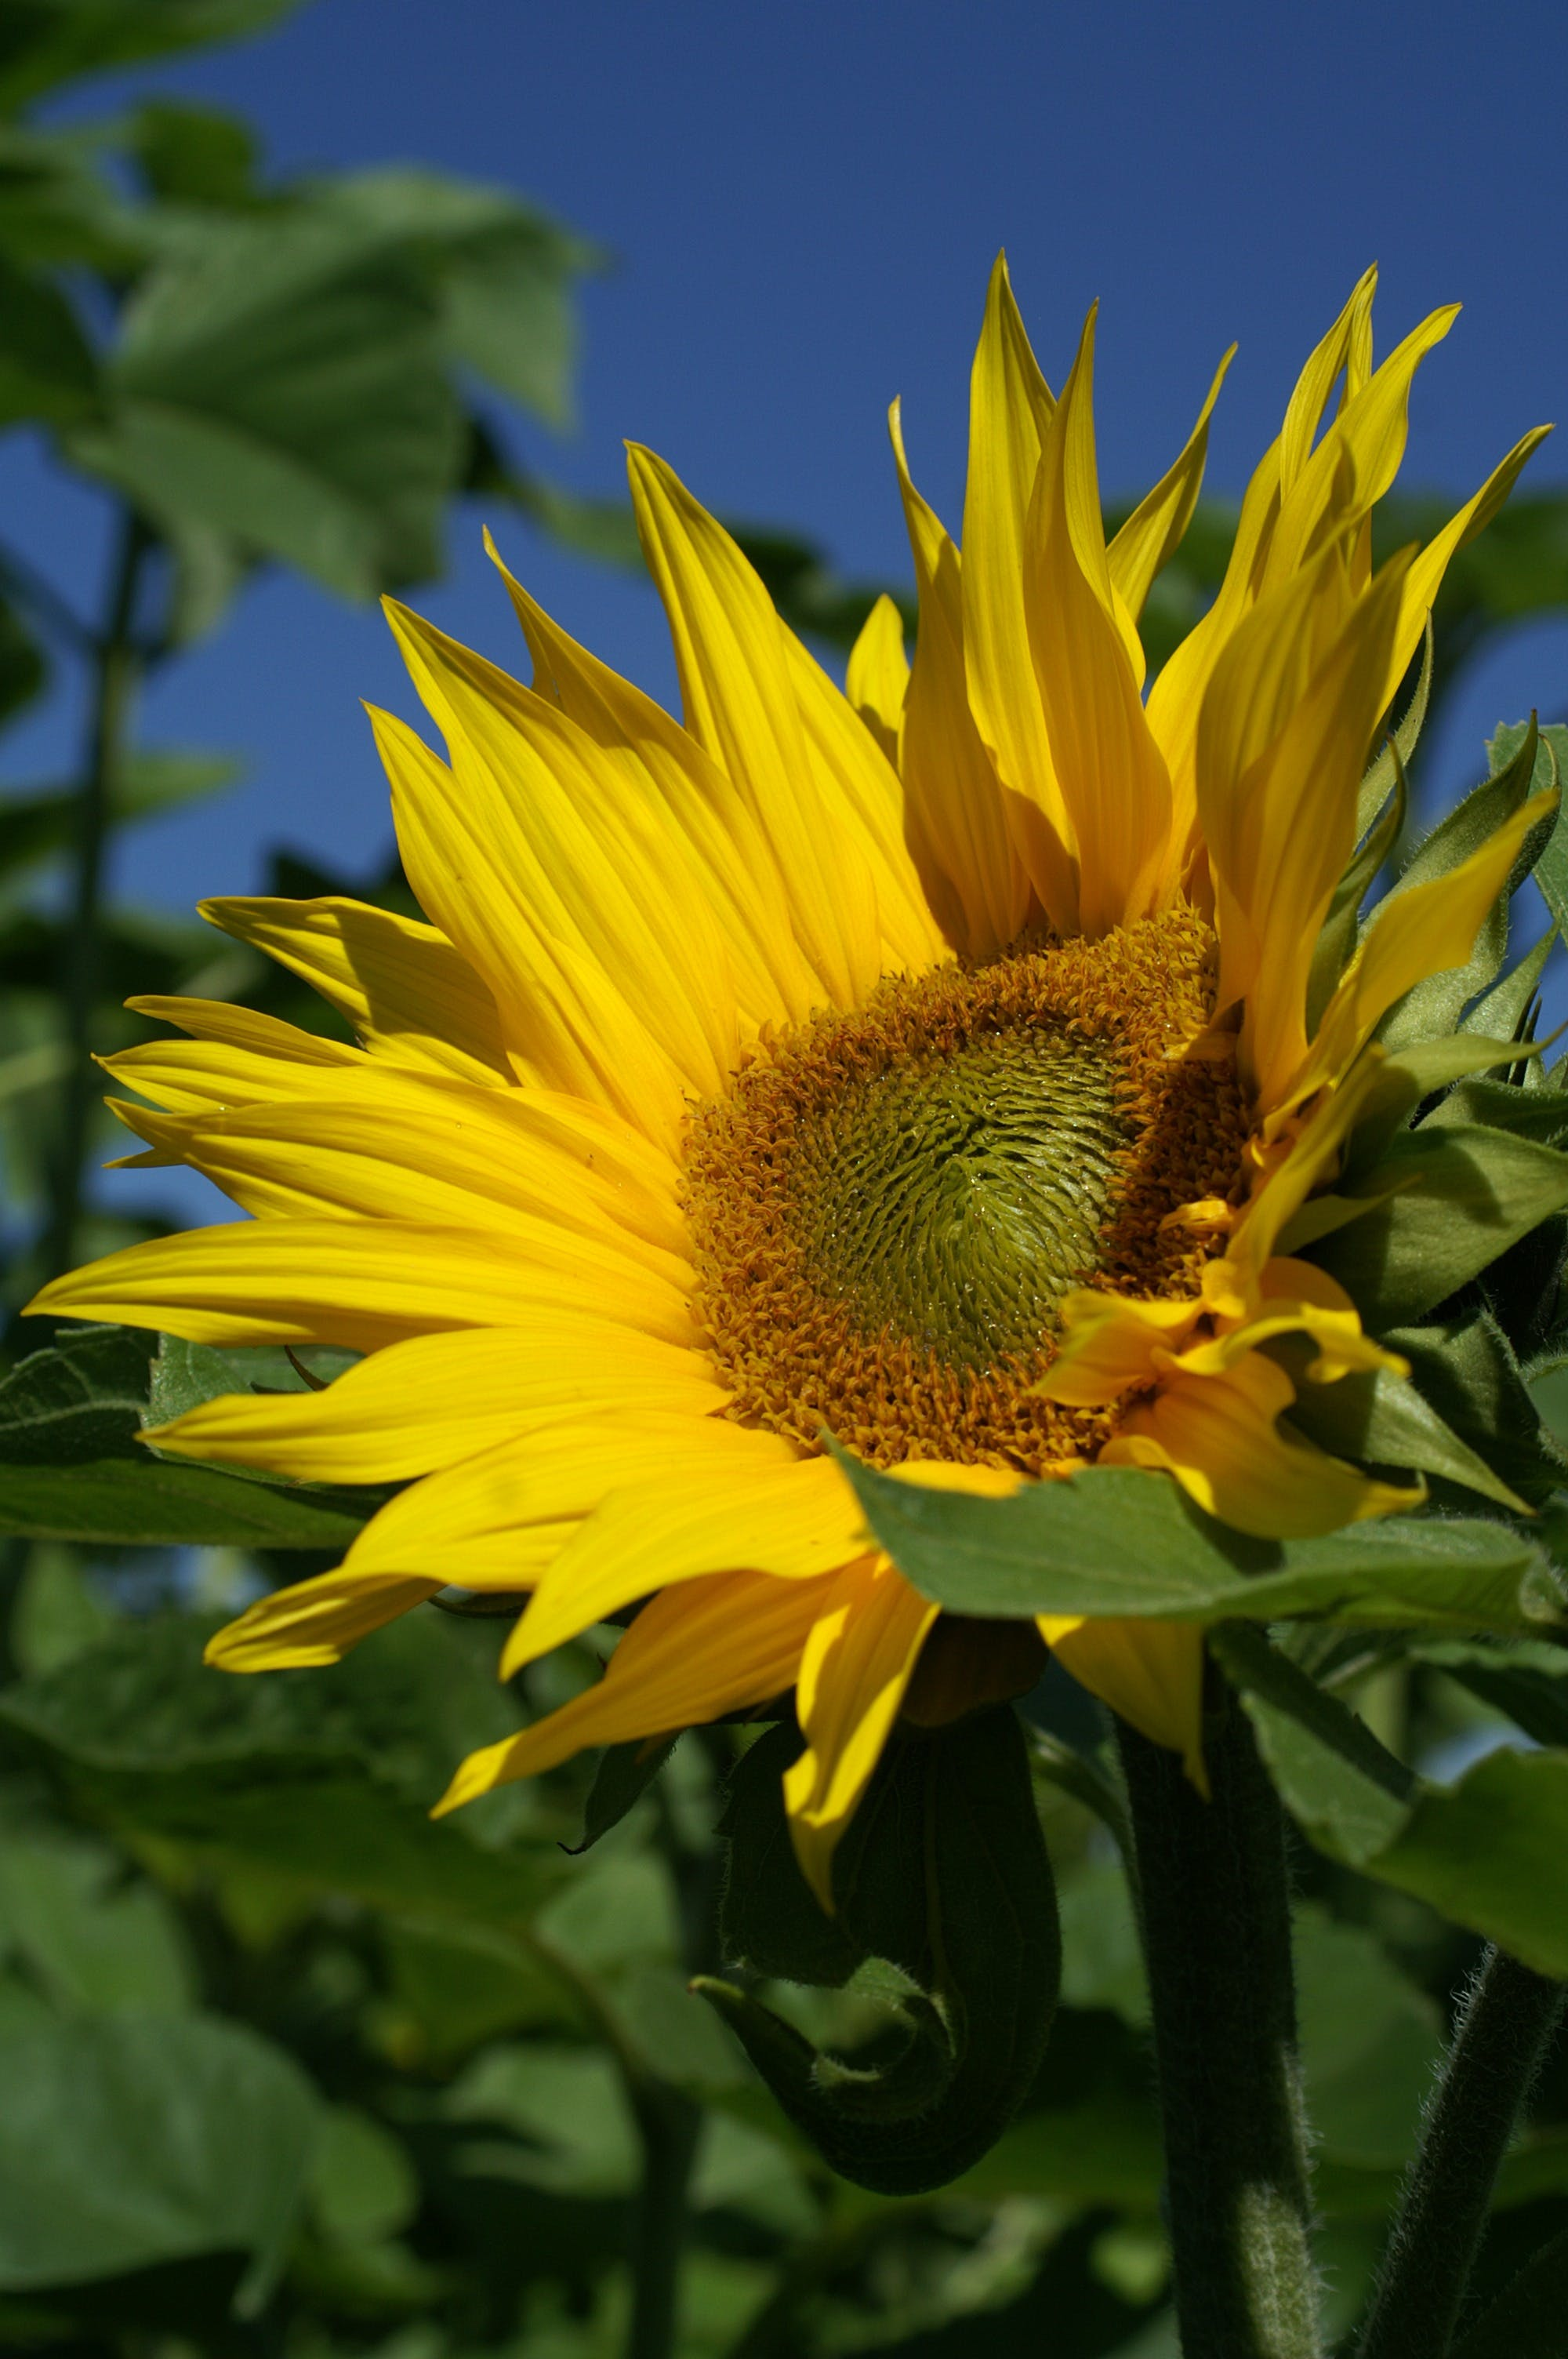 Sunflower Under Blue Sky during Daytime